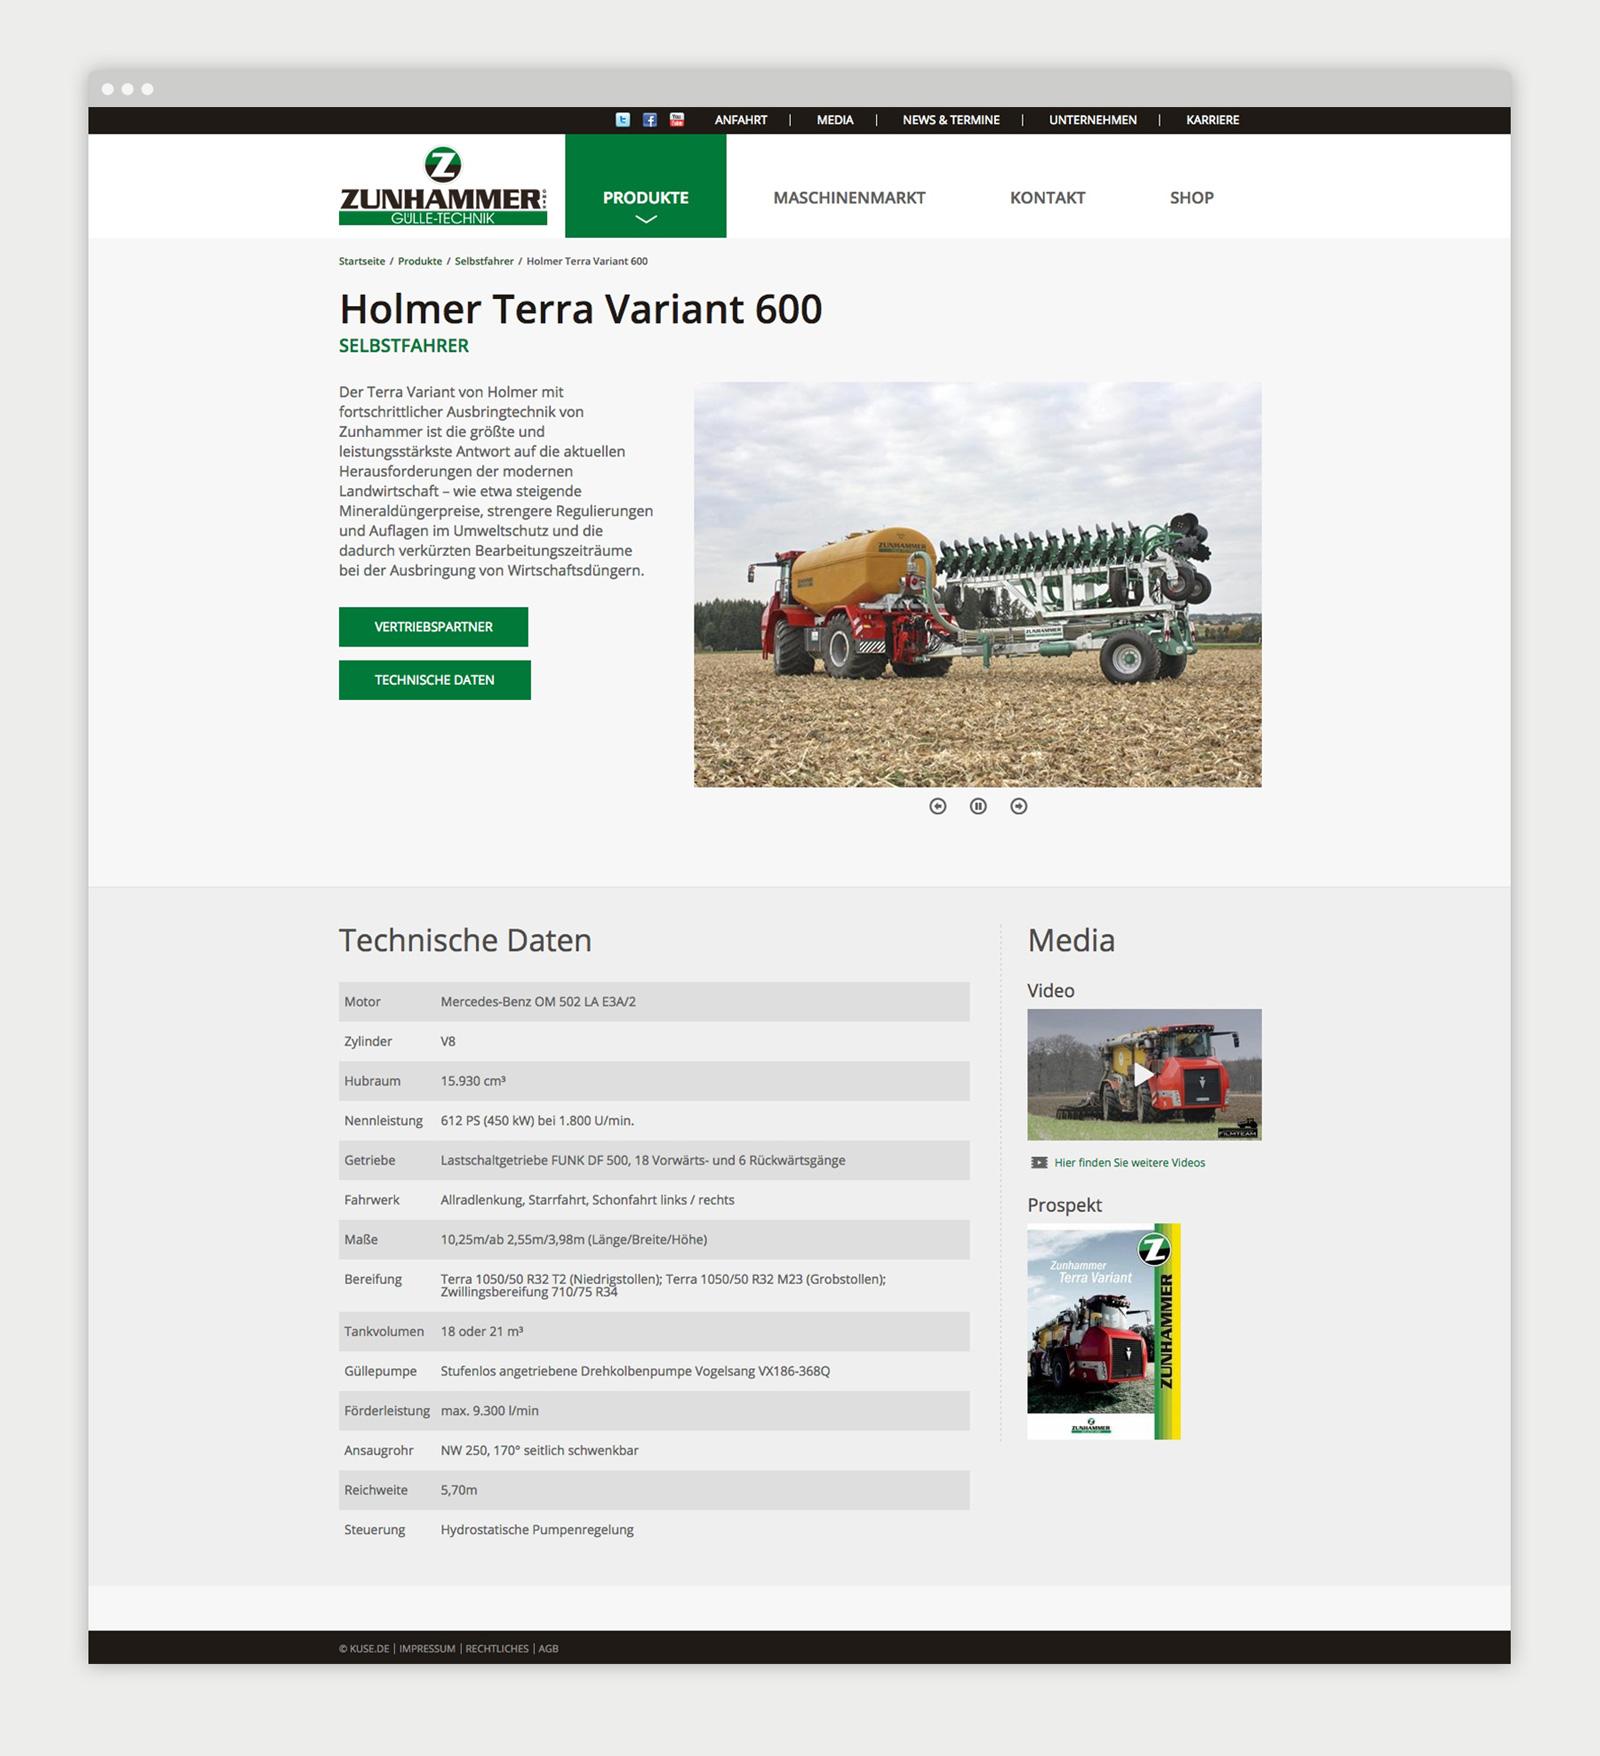 Zunhammer Website Produktübersicht